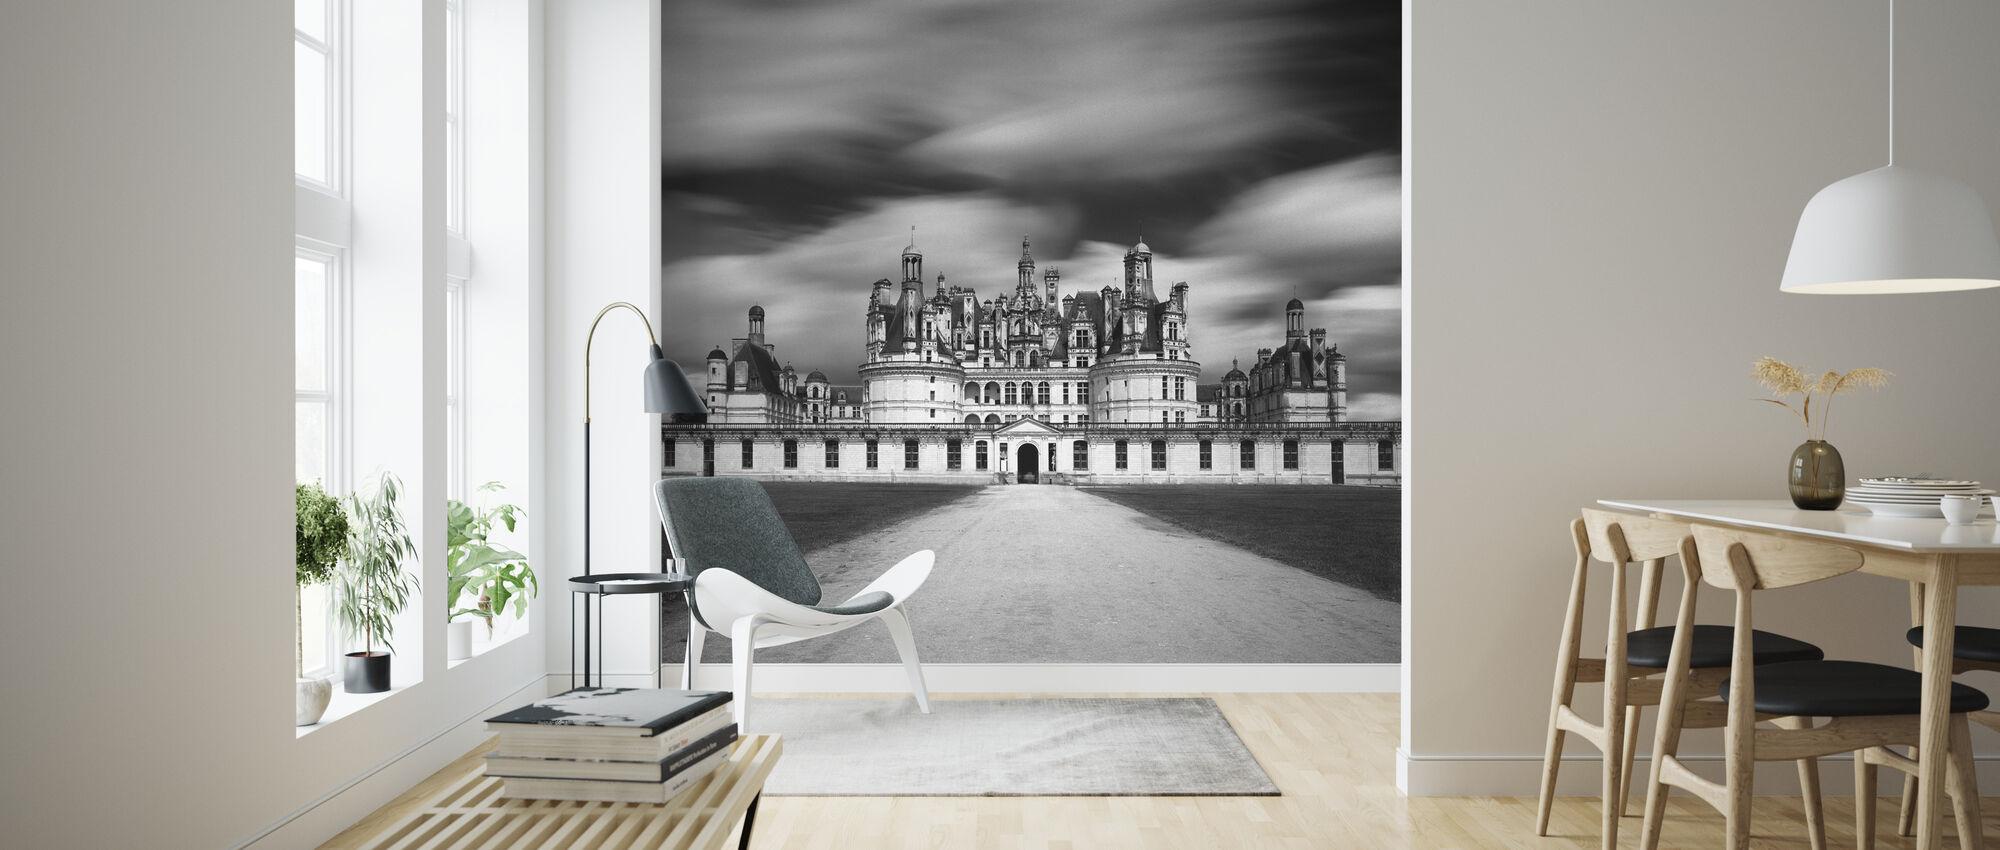 Chambord - Wallpaper - Living Room